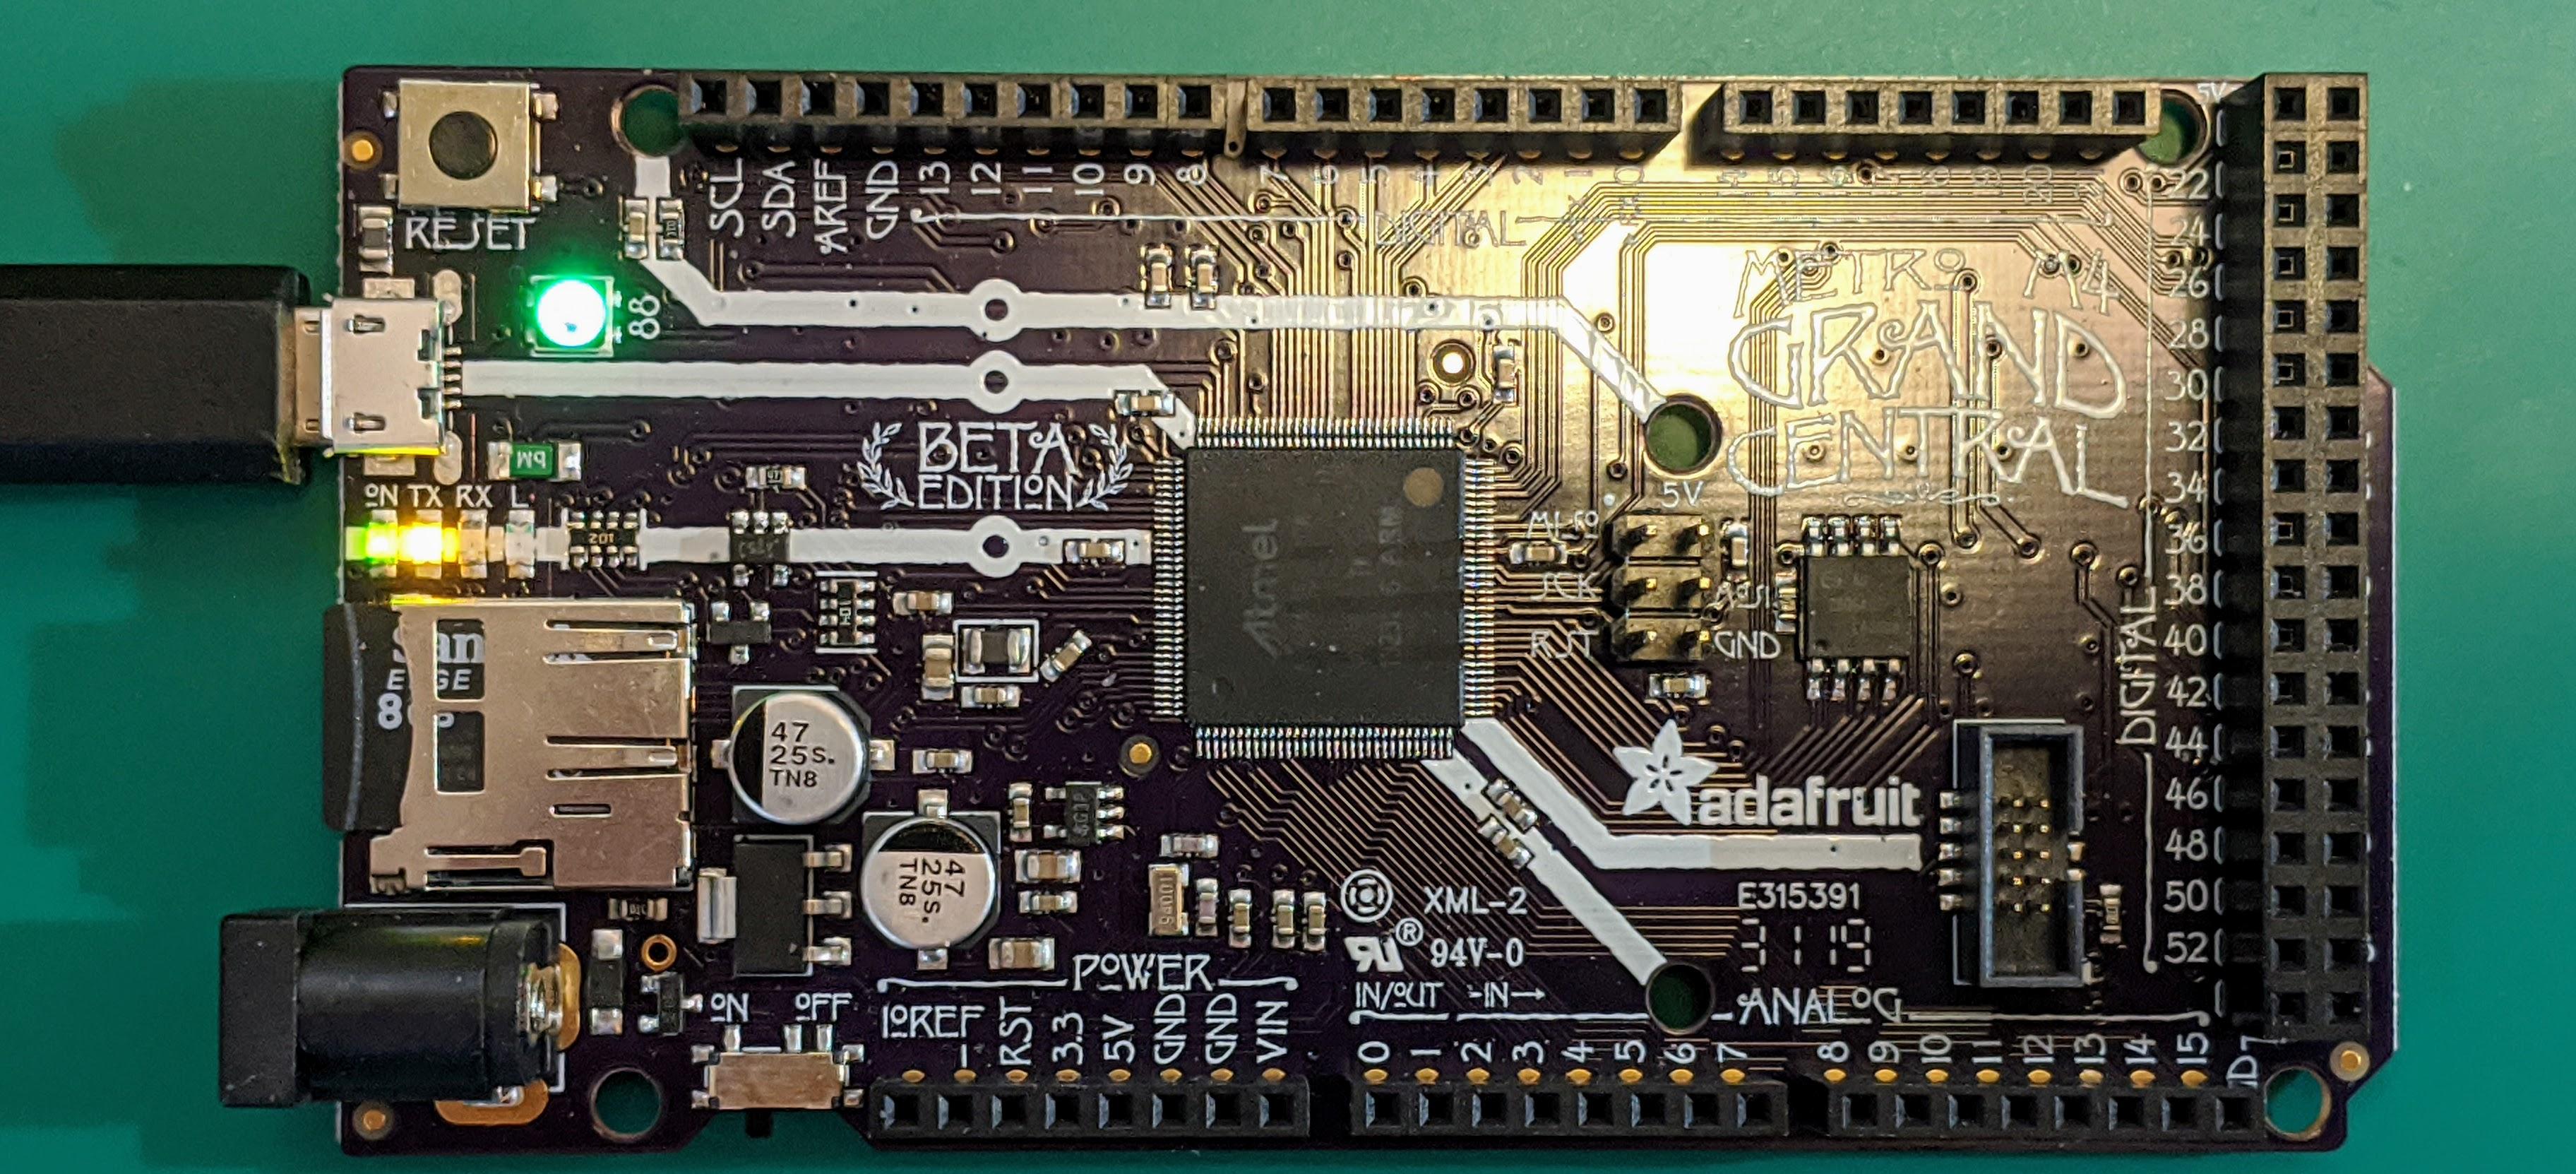 circuitpython_IMG_20200724_094803.jpg